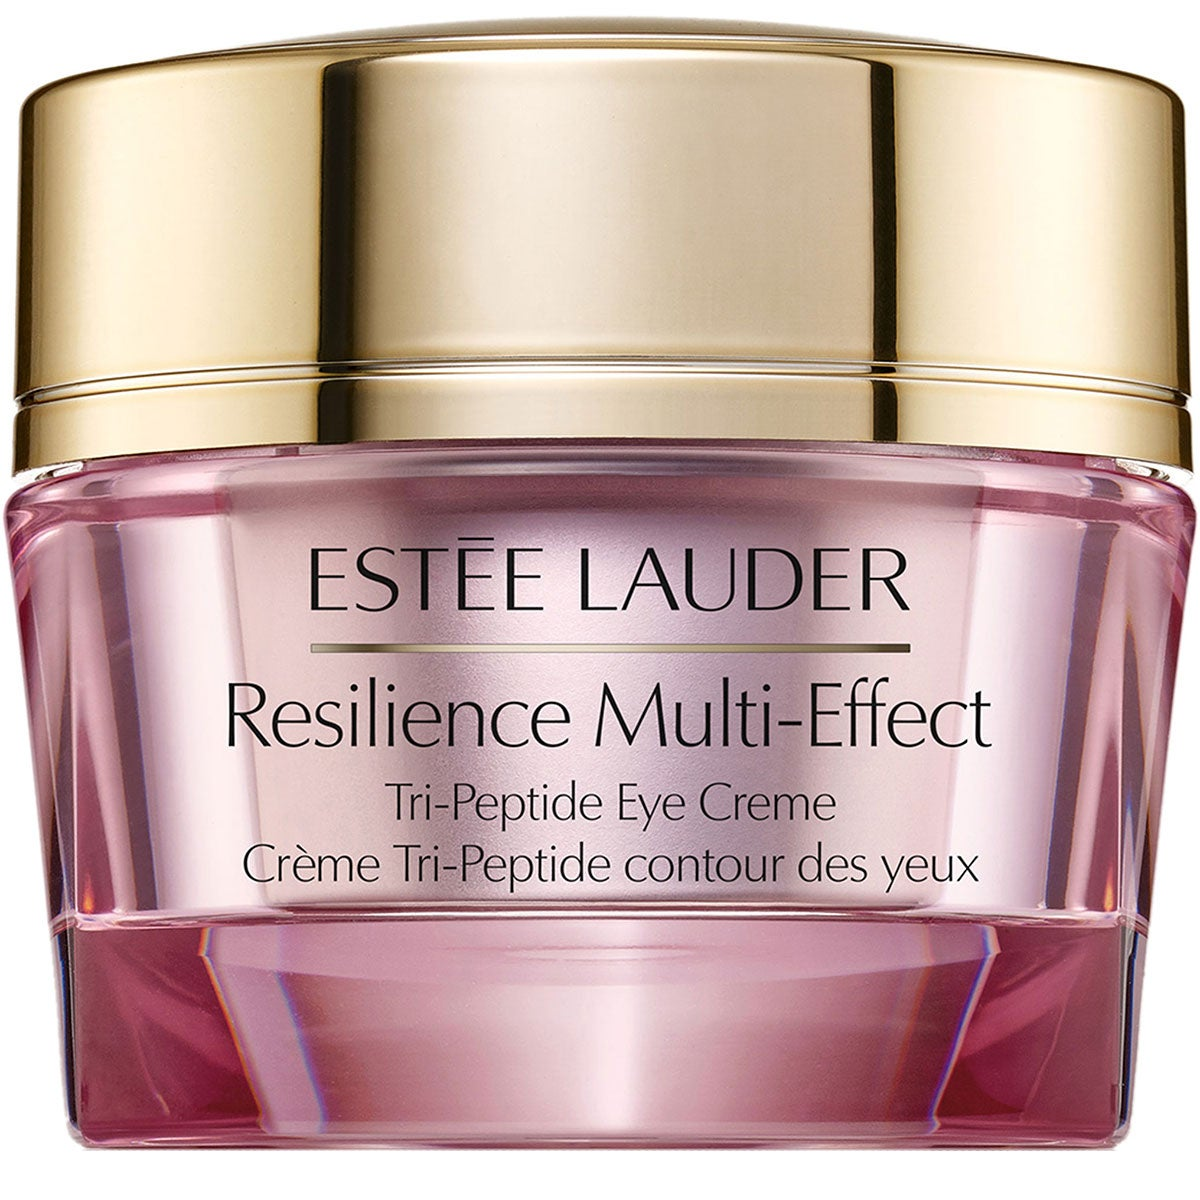 Resilience Multi-Effect Tri-Peptide Eye Creme, 15 ml Estée Lauder Ögonkräm